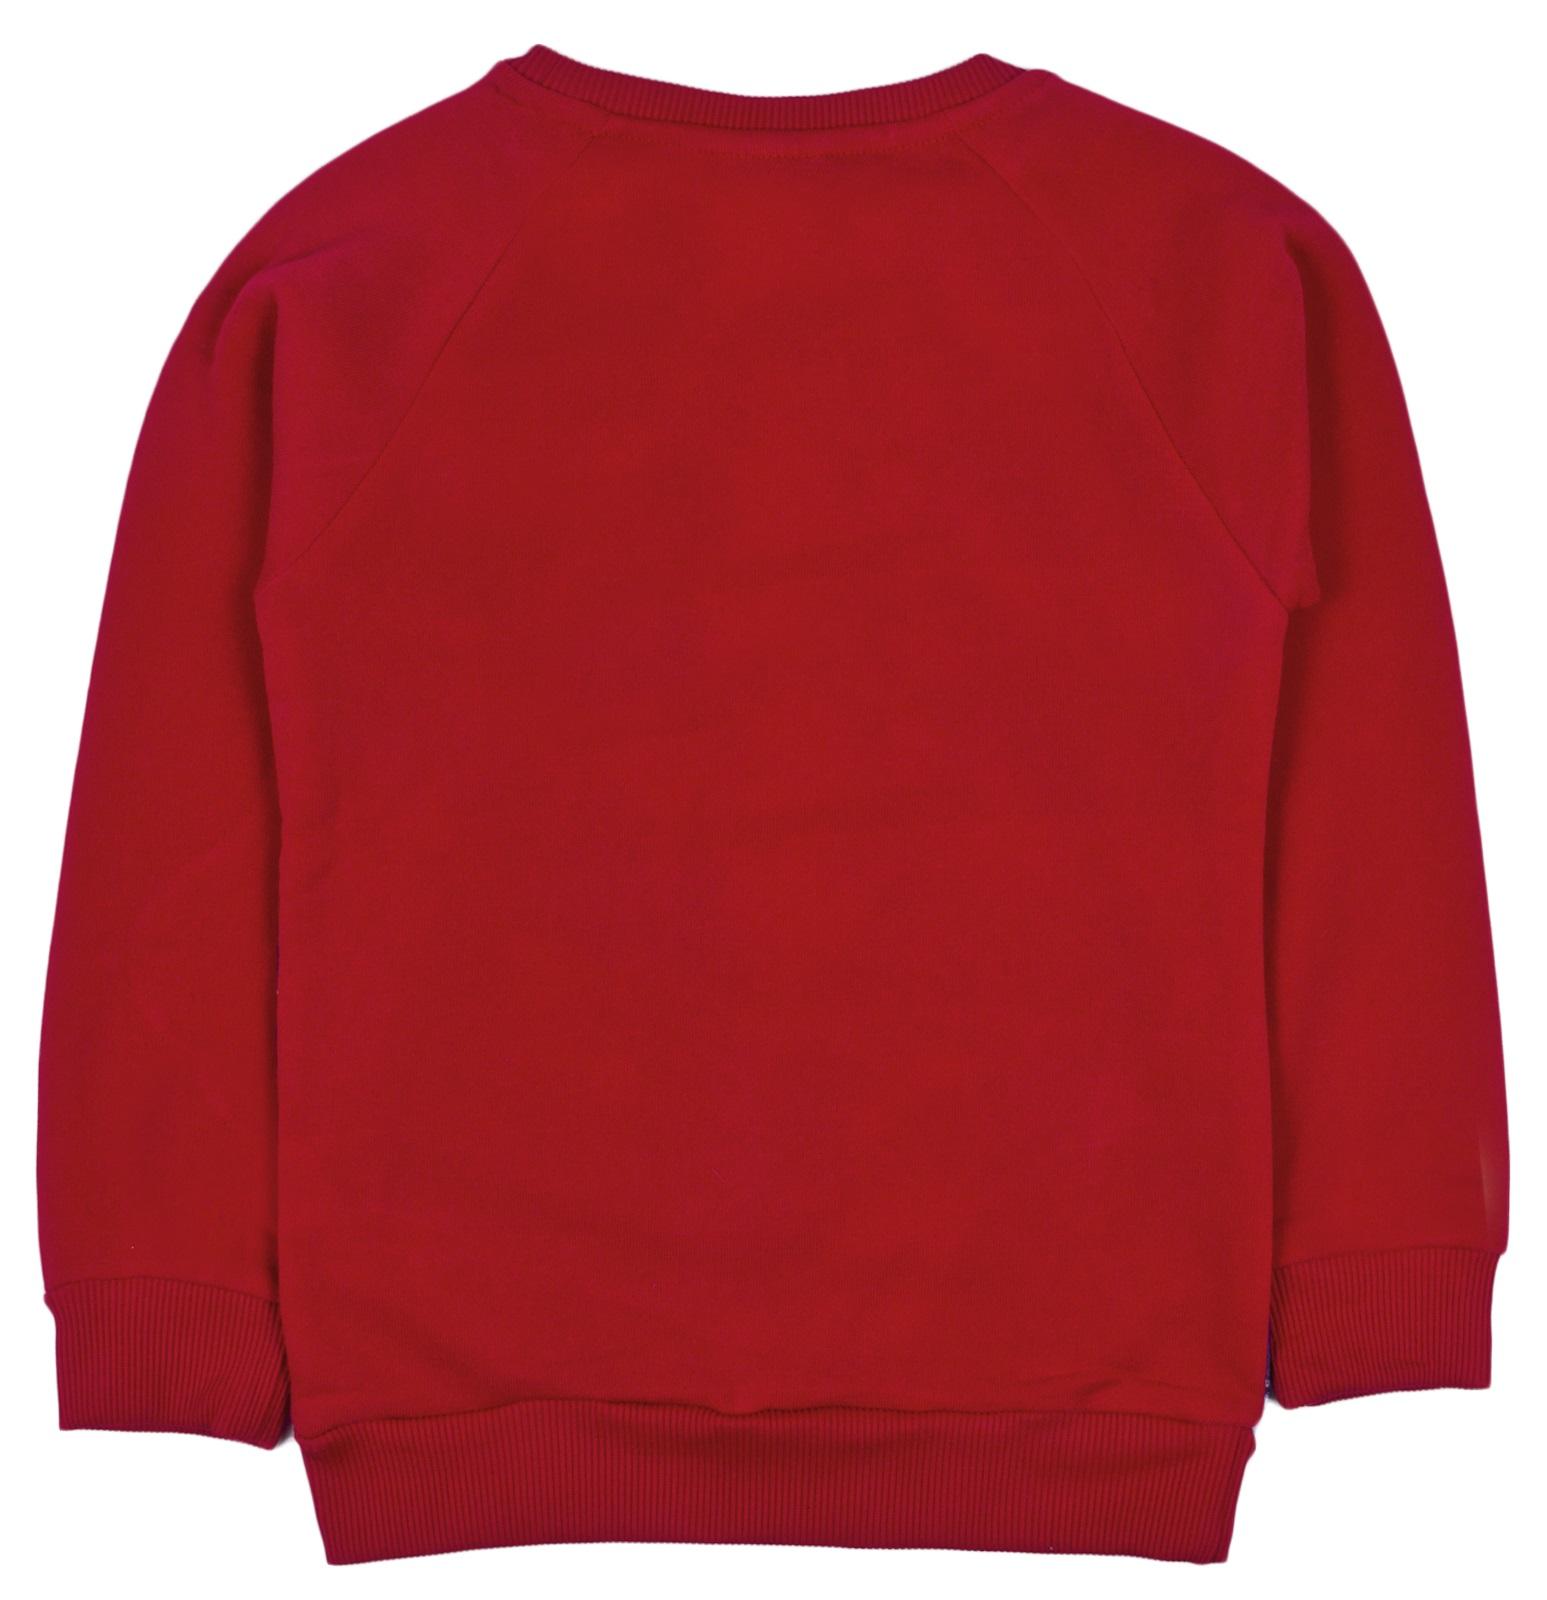 boys avengers christmas jumper warm winter xmas sweatshirt. Black Bedroom Furniture Sets. Home Design Ideas